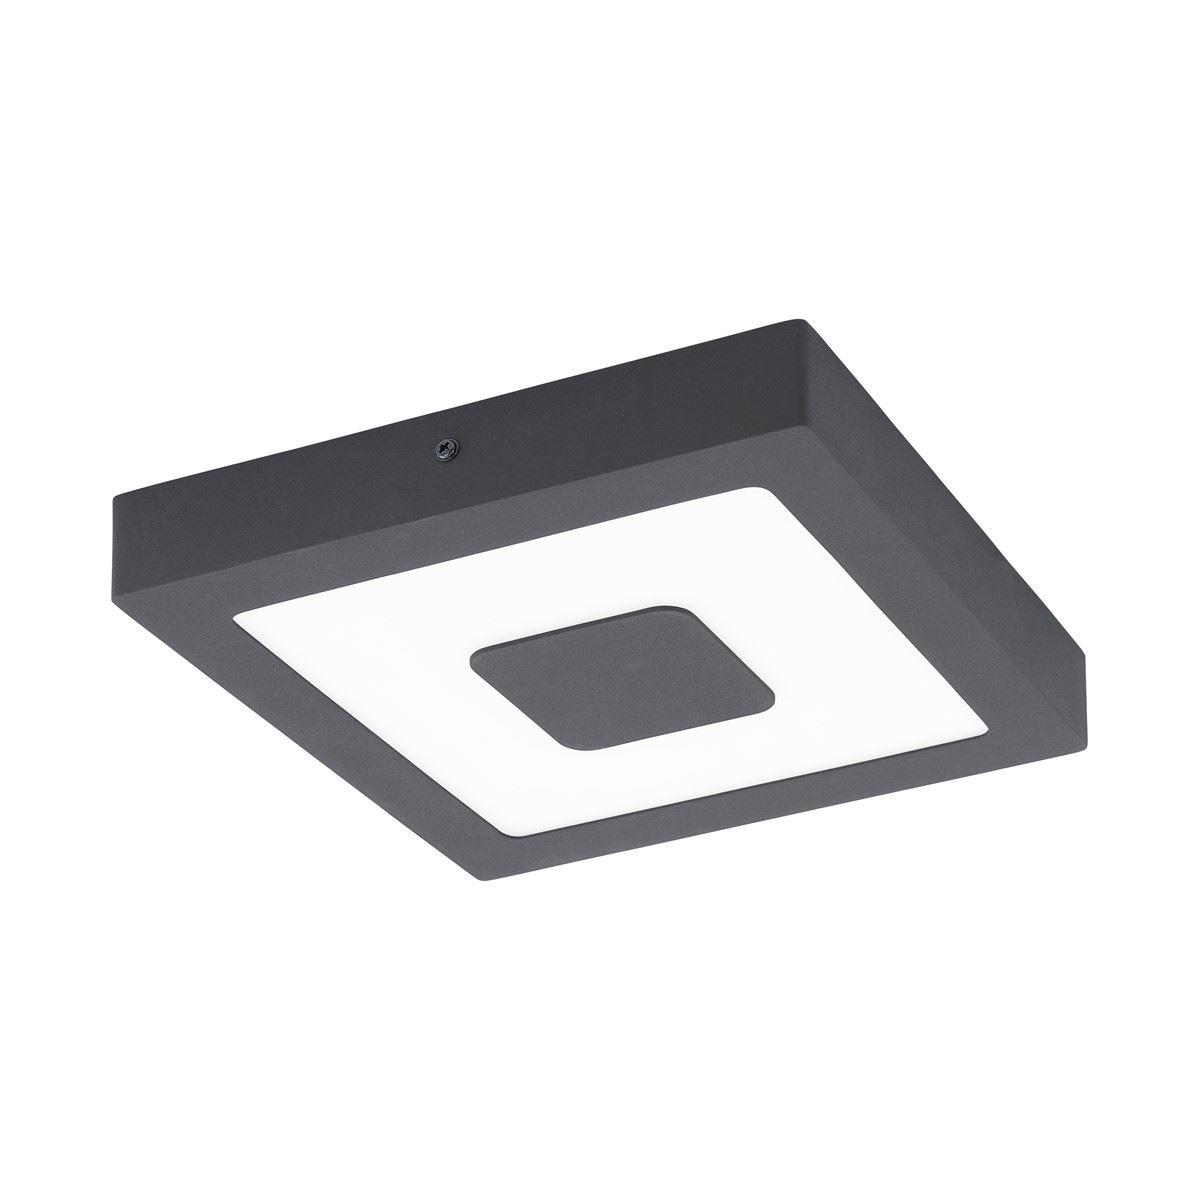 EGLO Al-Led-Dl Black Iphias, Ceiling Light Aluminum Casting Black